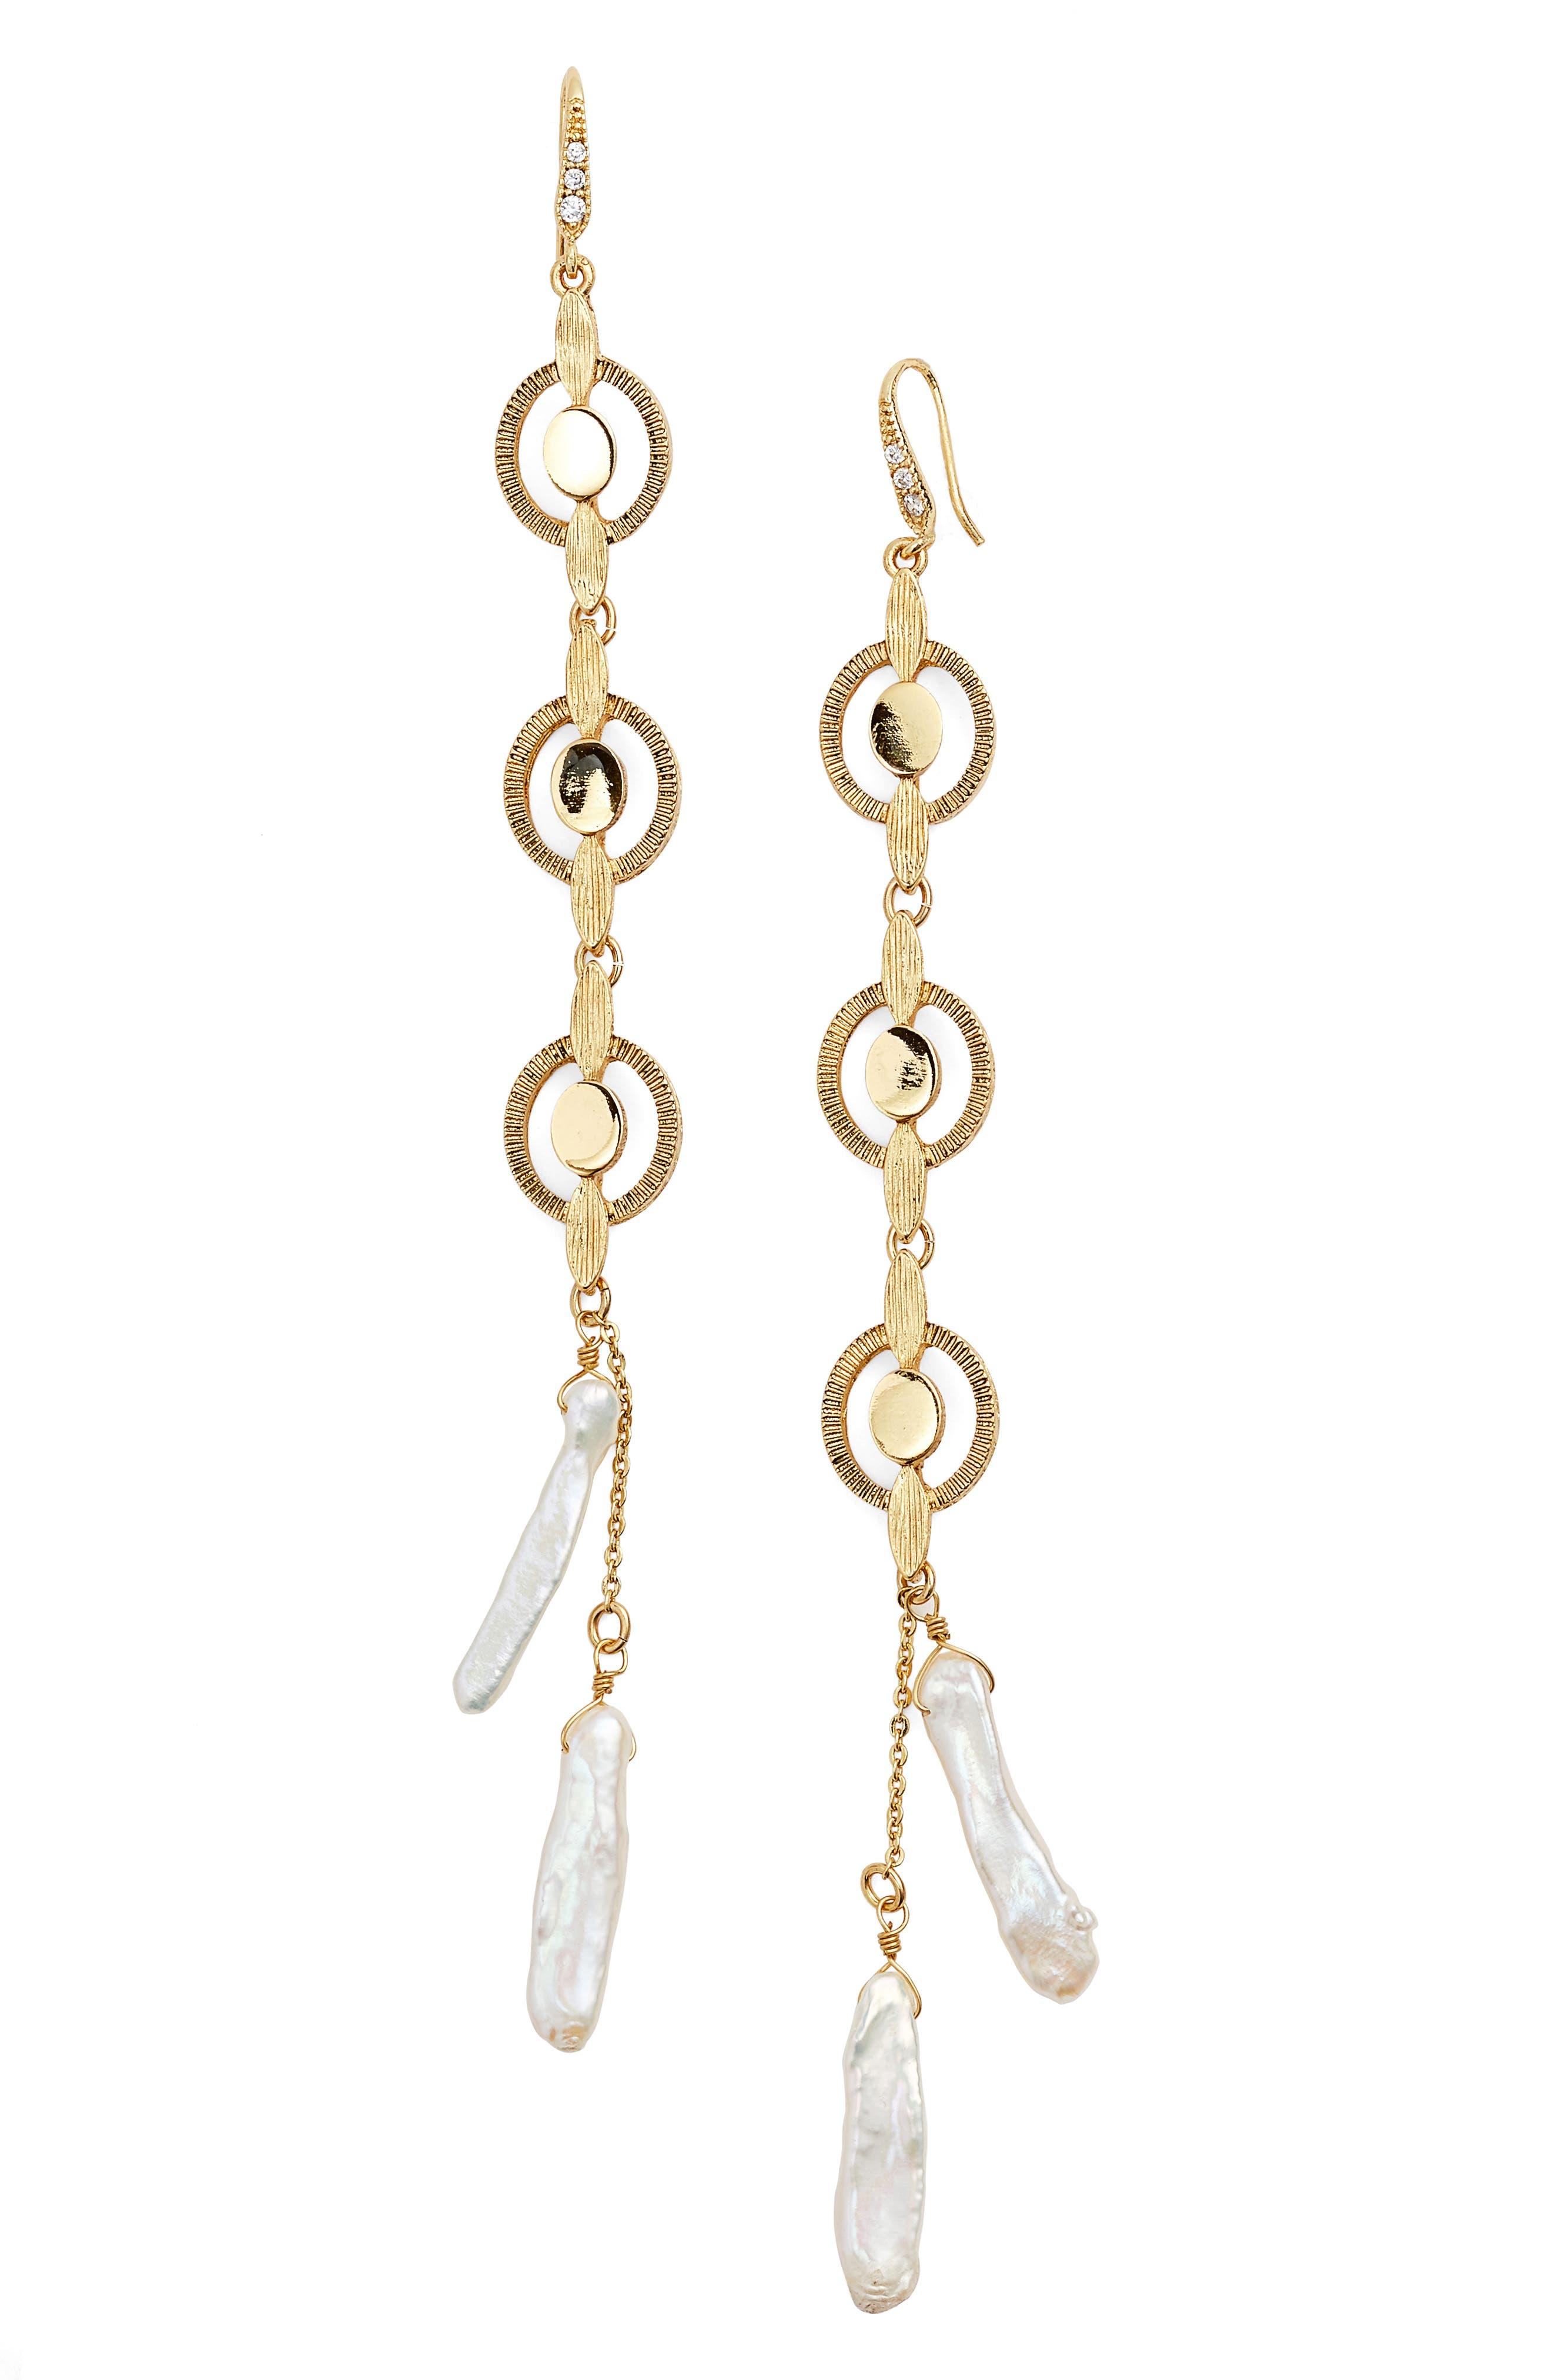 BADGLEY MISCHKA COLLECTION Badgley Mischka Katie Freshwater Pearl Linear Drop Earrings, Main, color, GOLD